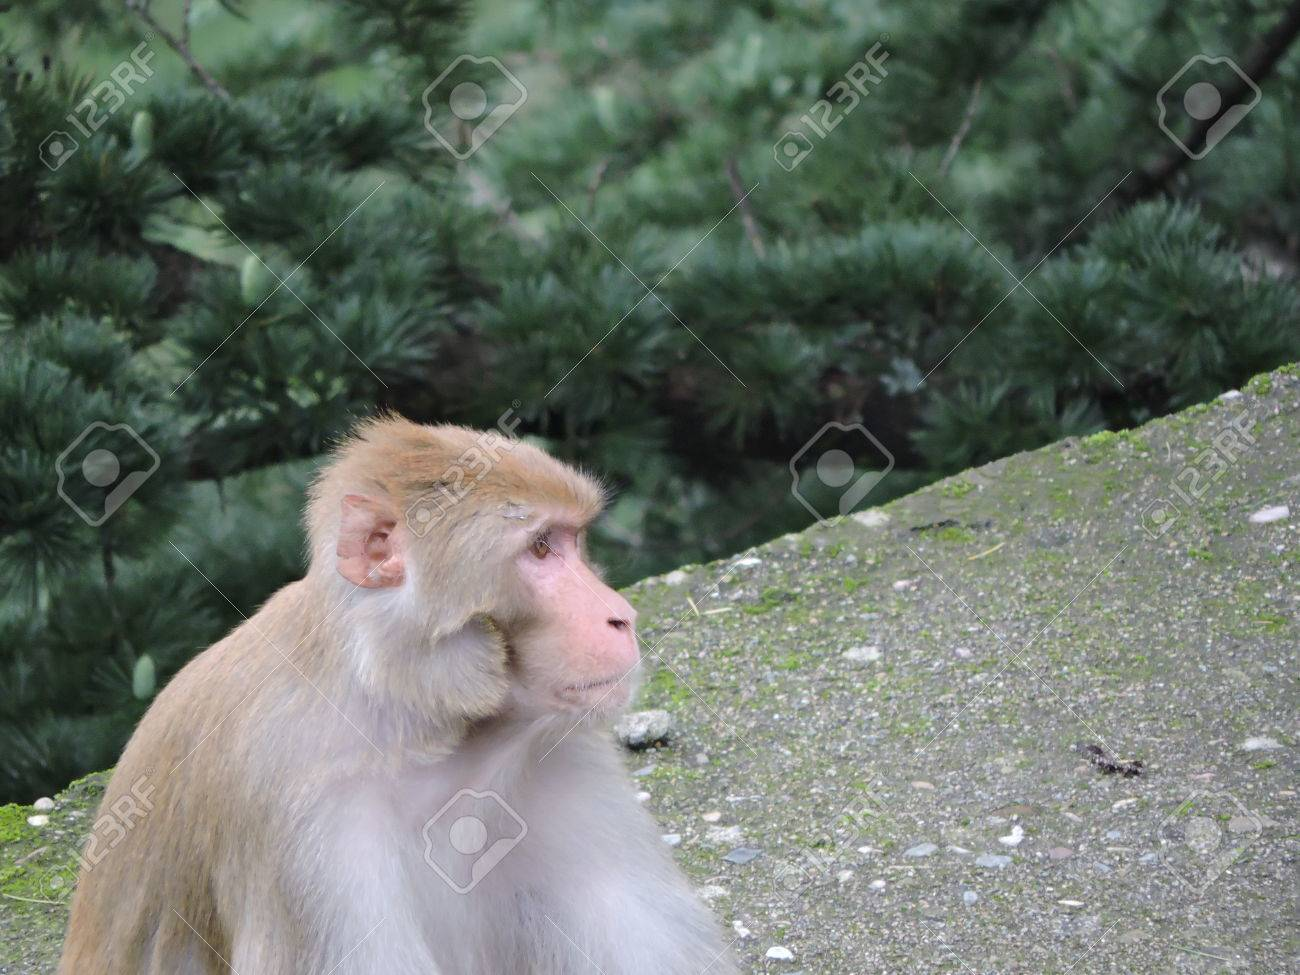 Monkey Rhesus Macaque India Stock Photo - 69420339